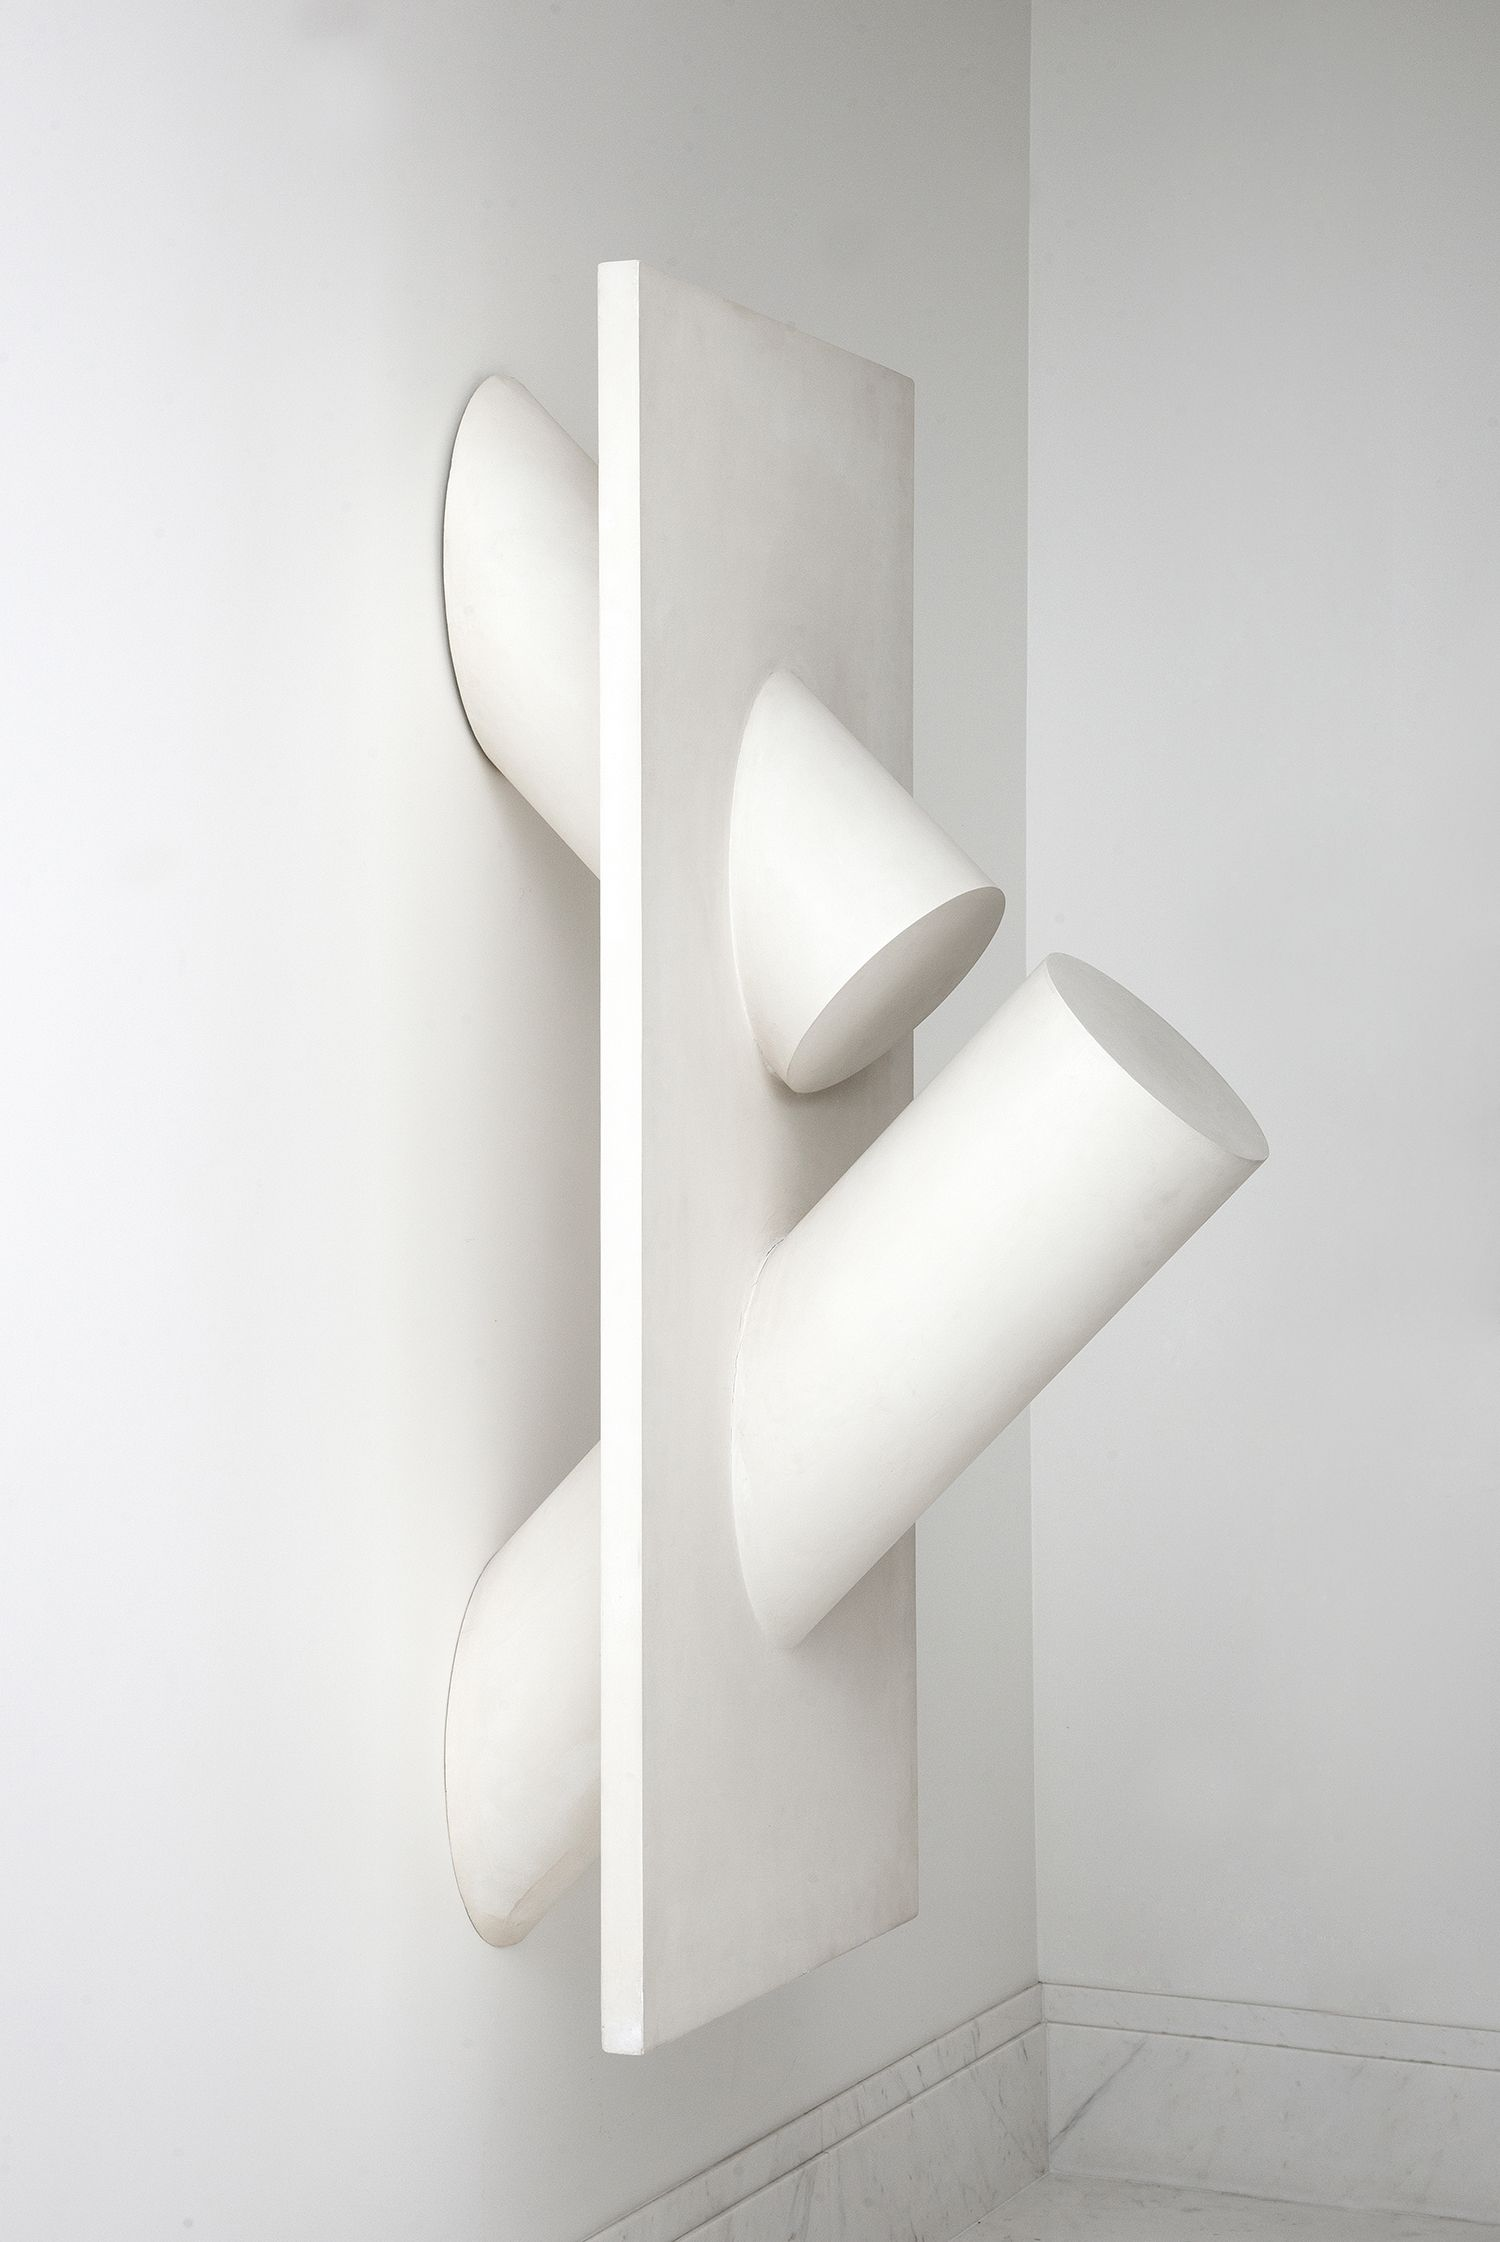 Sergio Camargo minimalist sculpture. Bc.